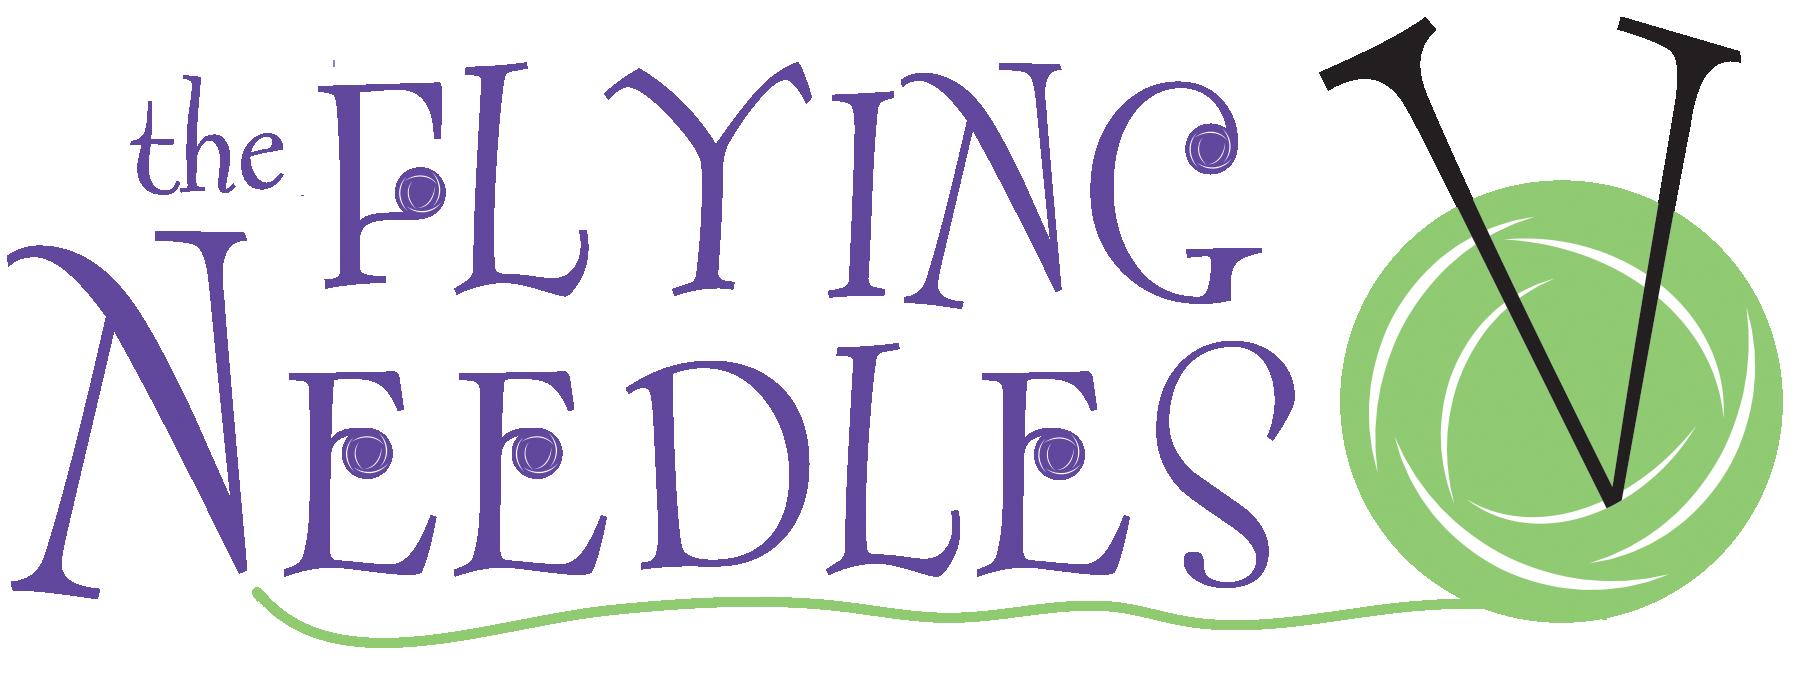 The flying needles yarn. Needle clipart knitting needle